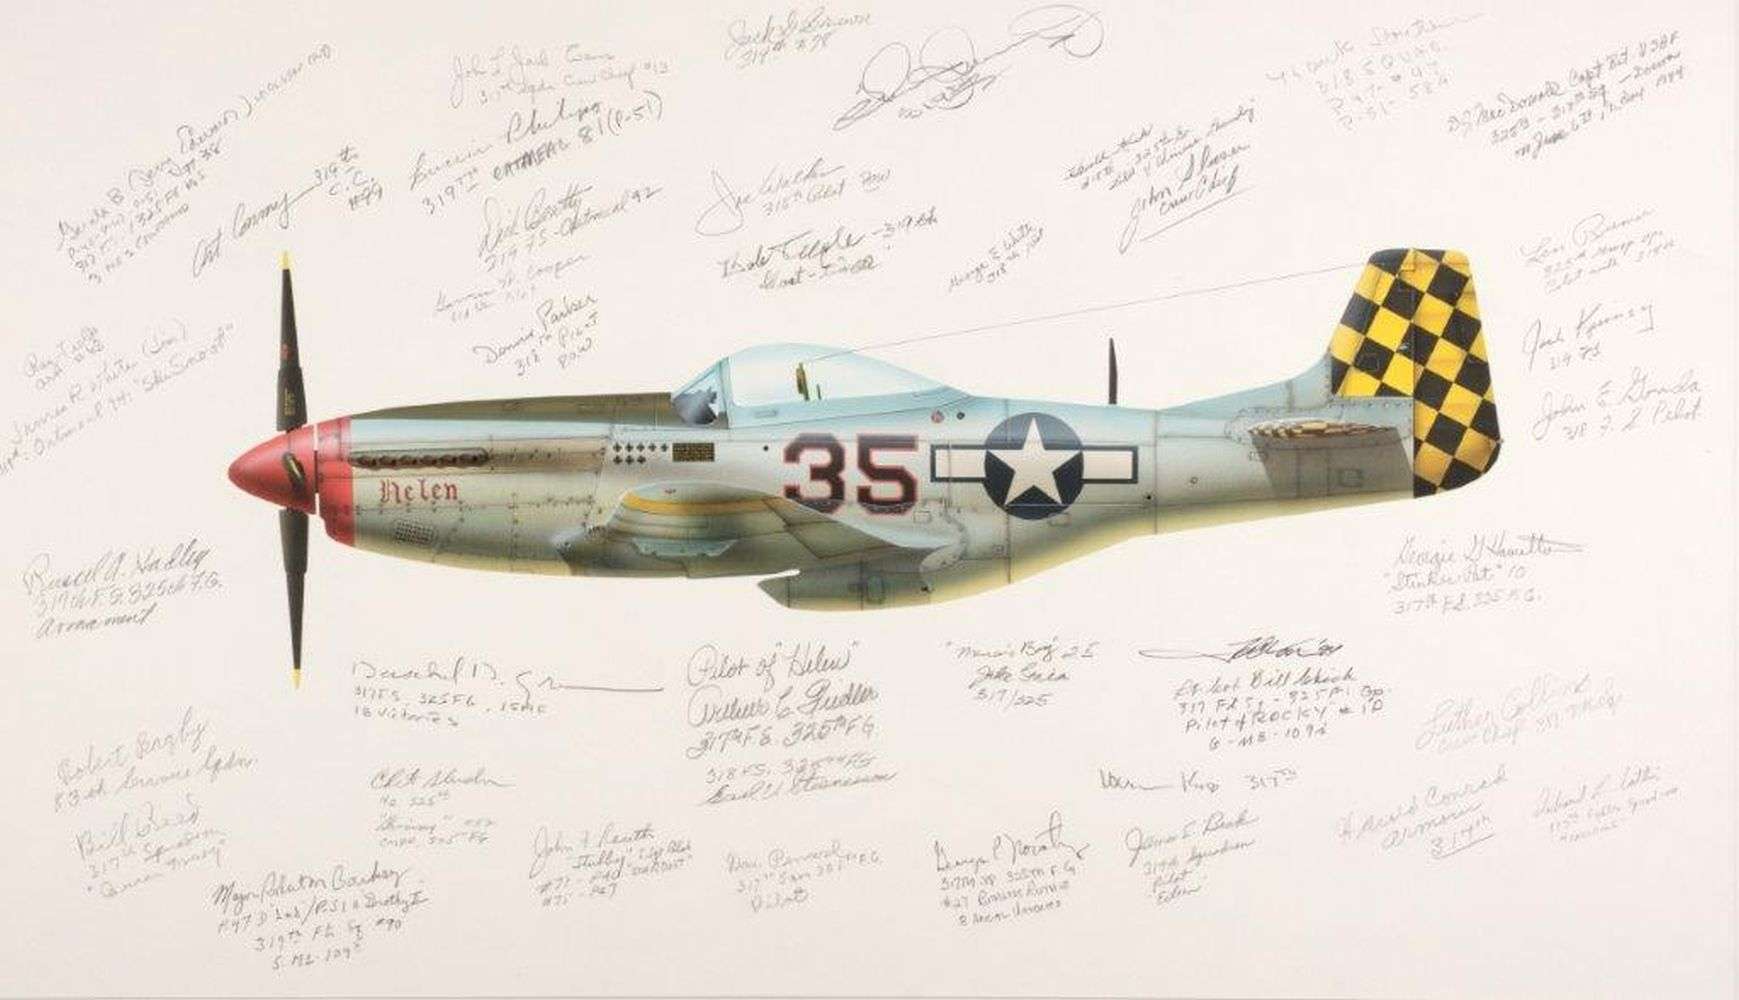 * Valo (John C., circa 1963), 325th Fighter Group